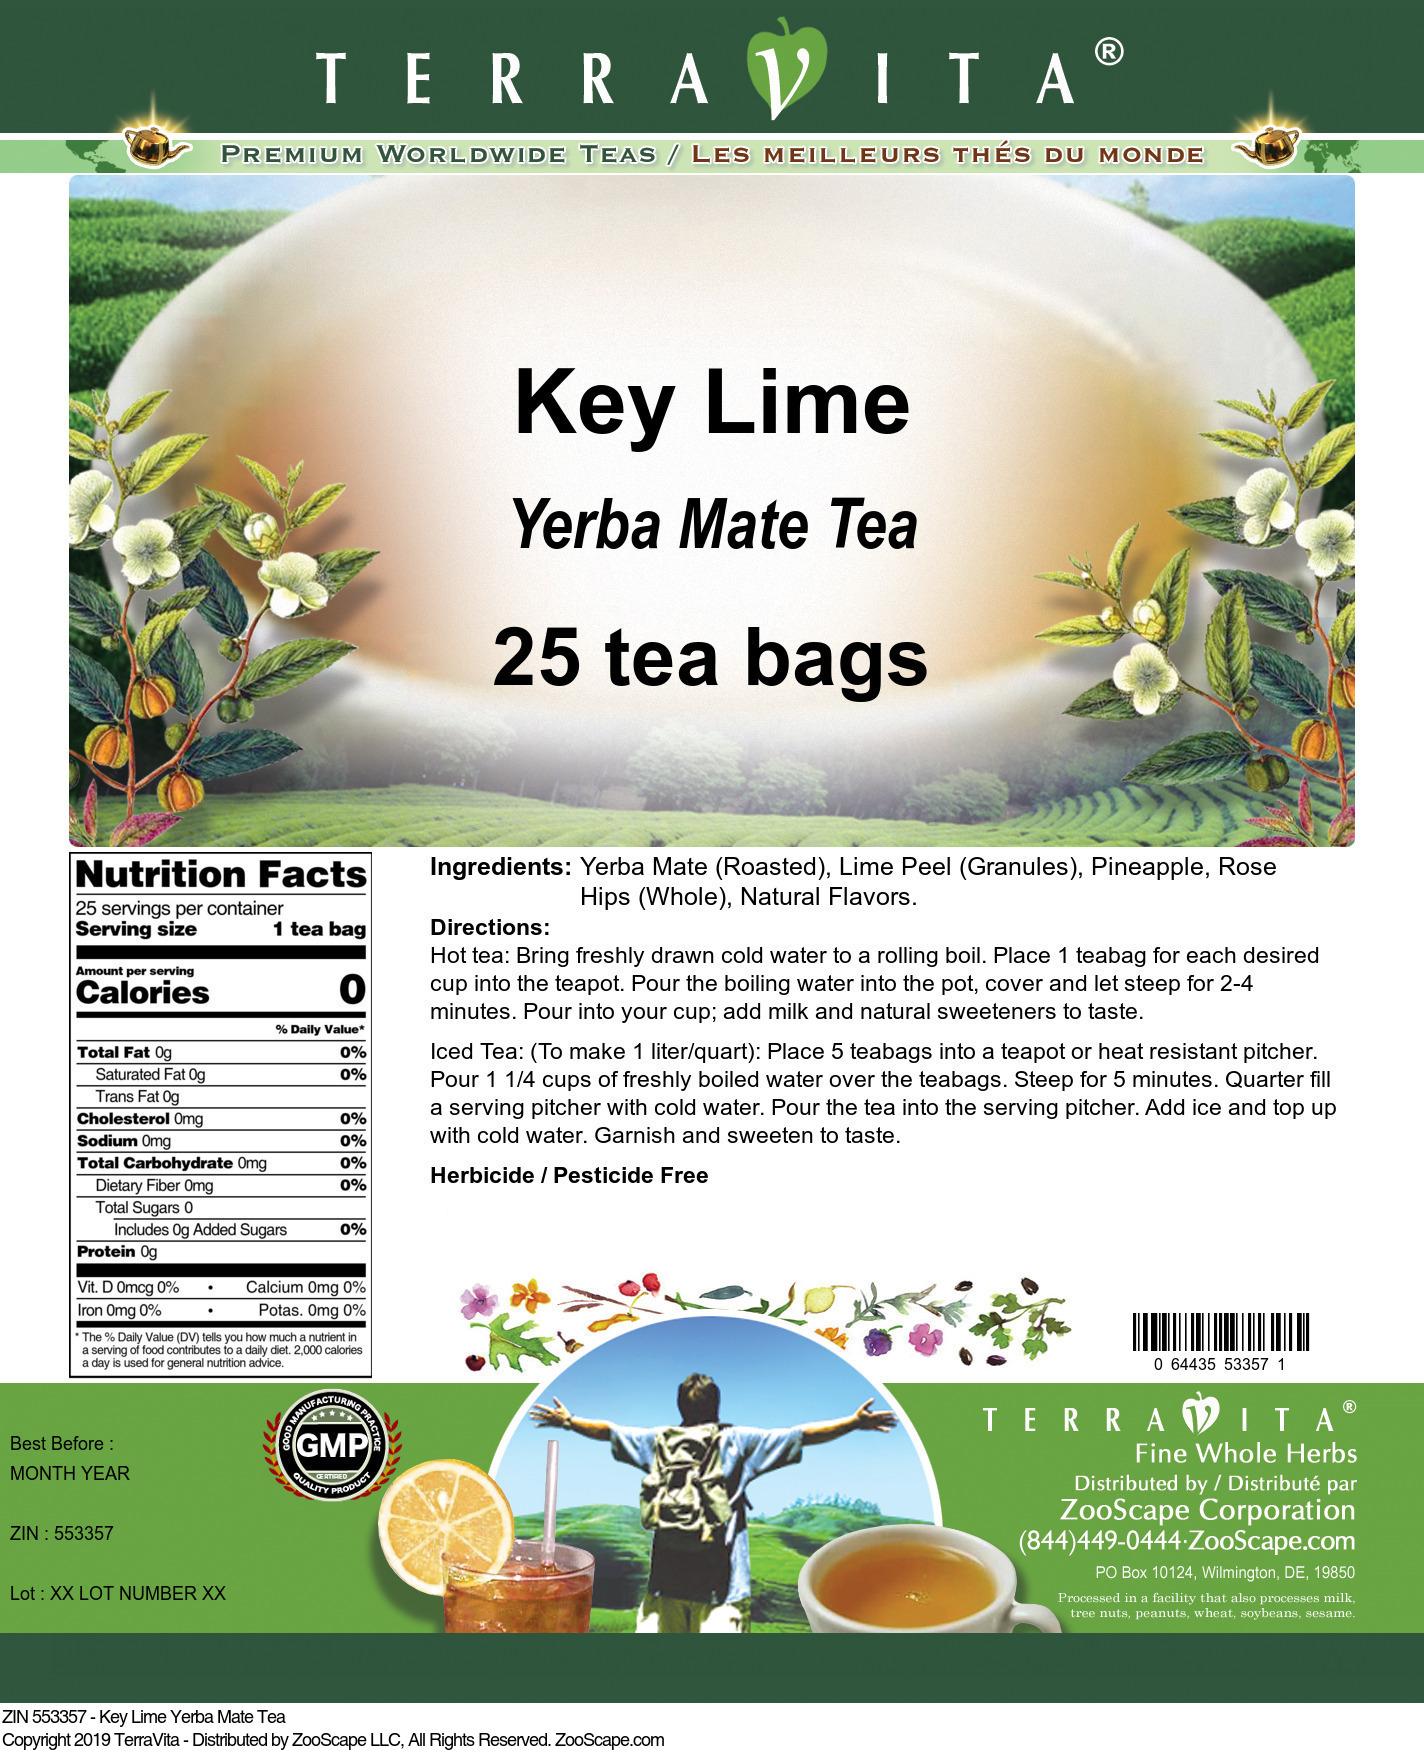 Key Lime Yerba Mate